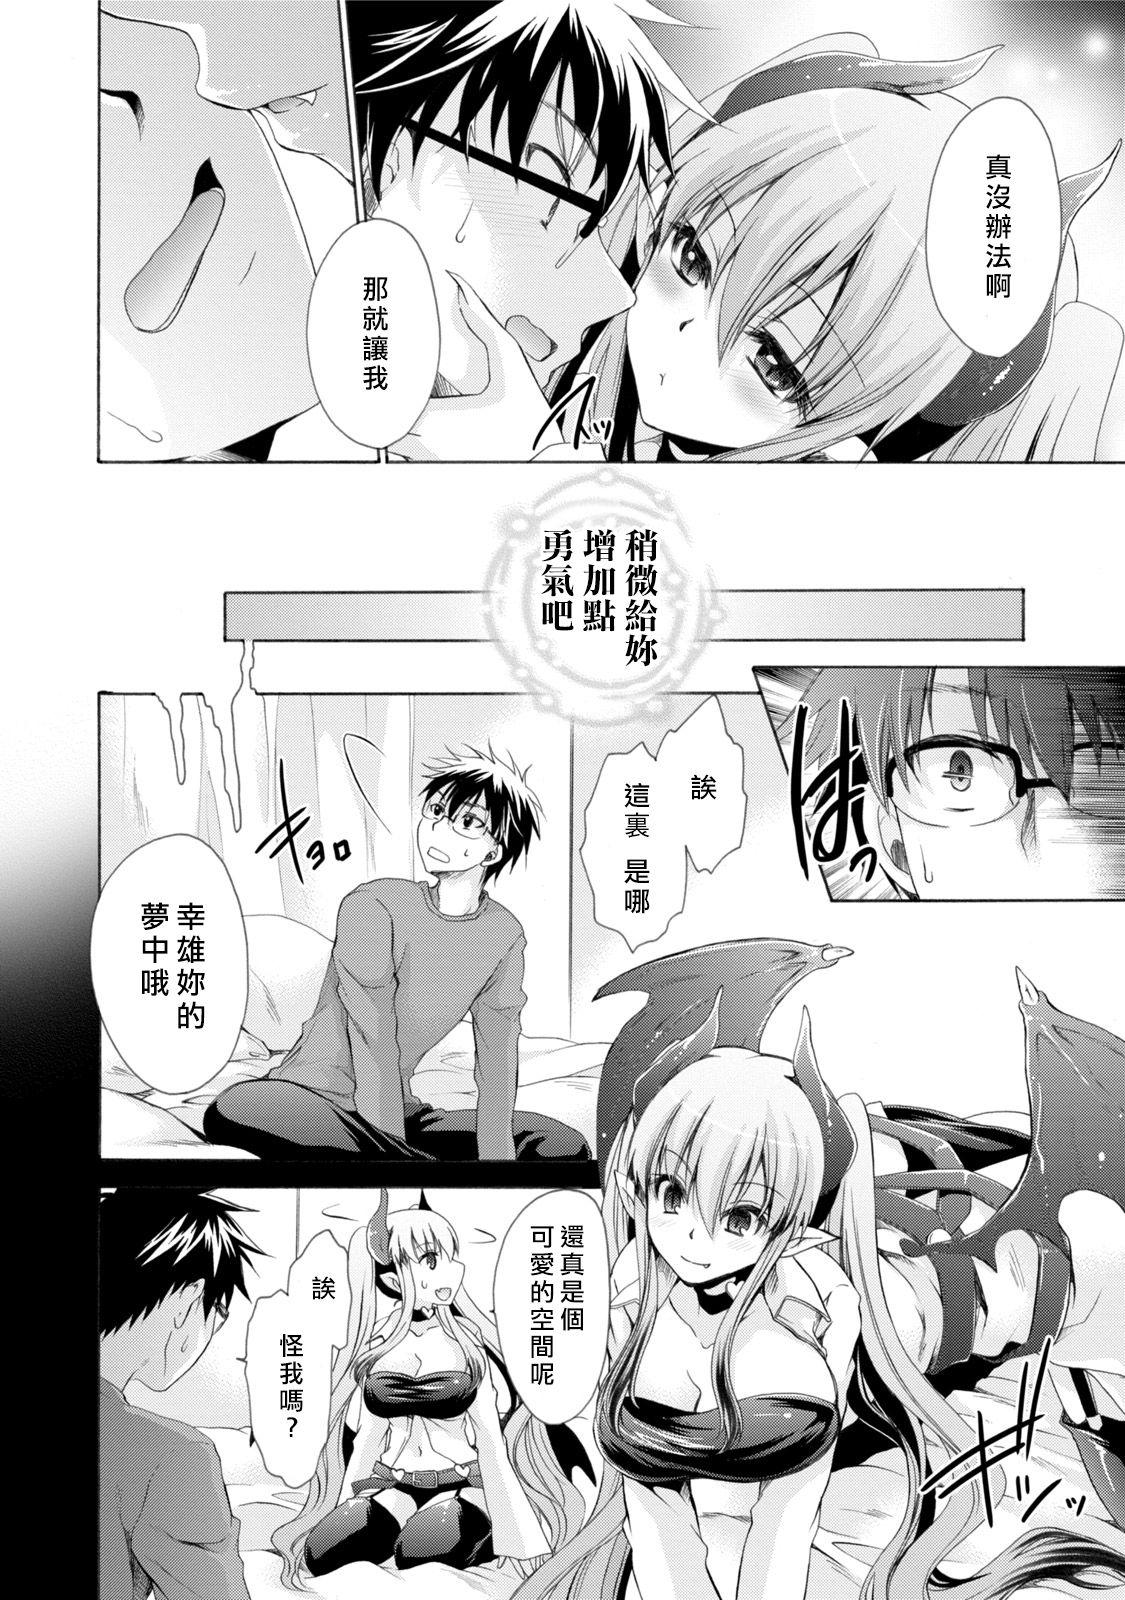 [Shinonome Ryu] Ore to Kanojo to Owaru Sekai - World's end LoveStory ch.1-9 [Chinese] [爱弹幕汉化组] [Digital] 13